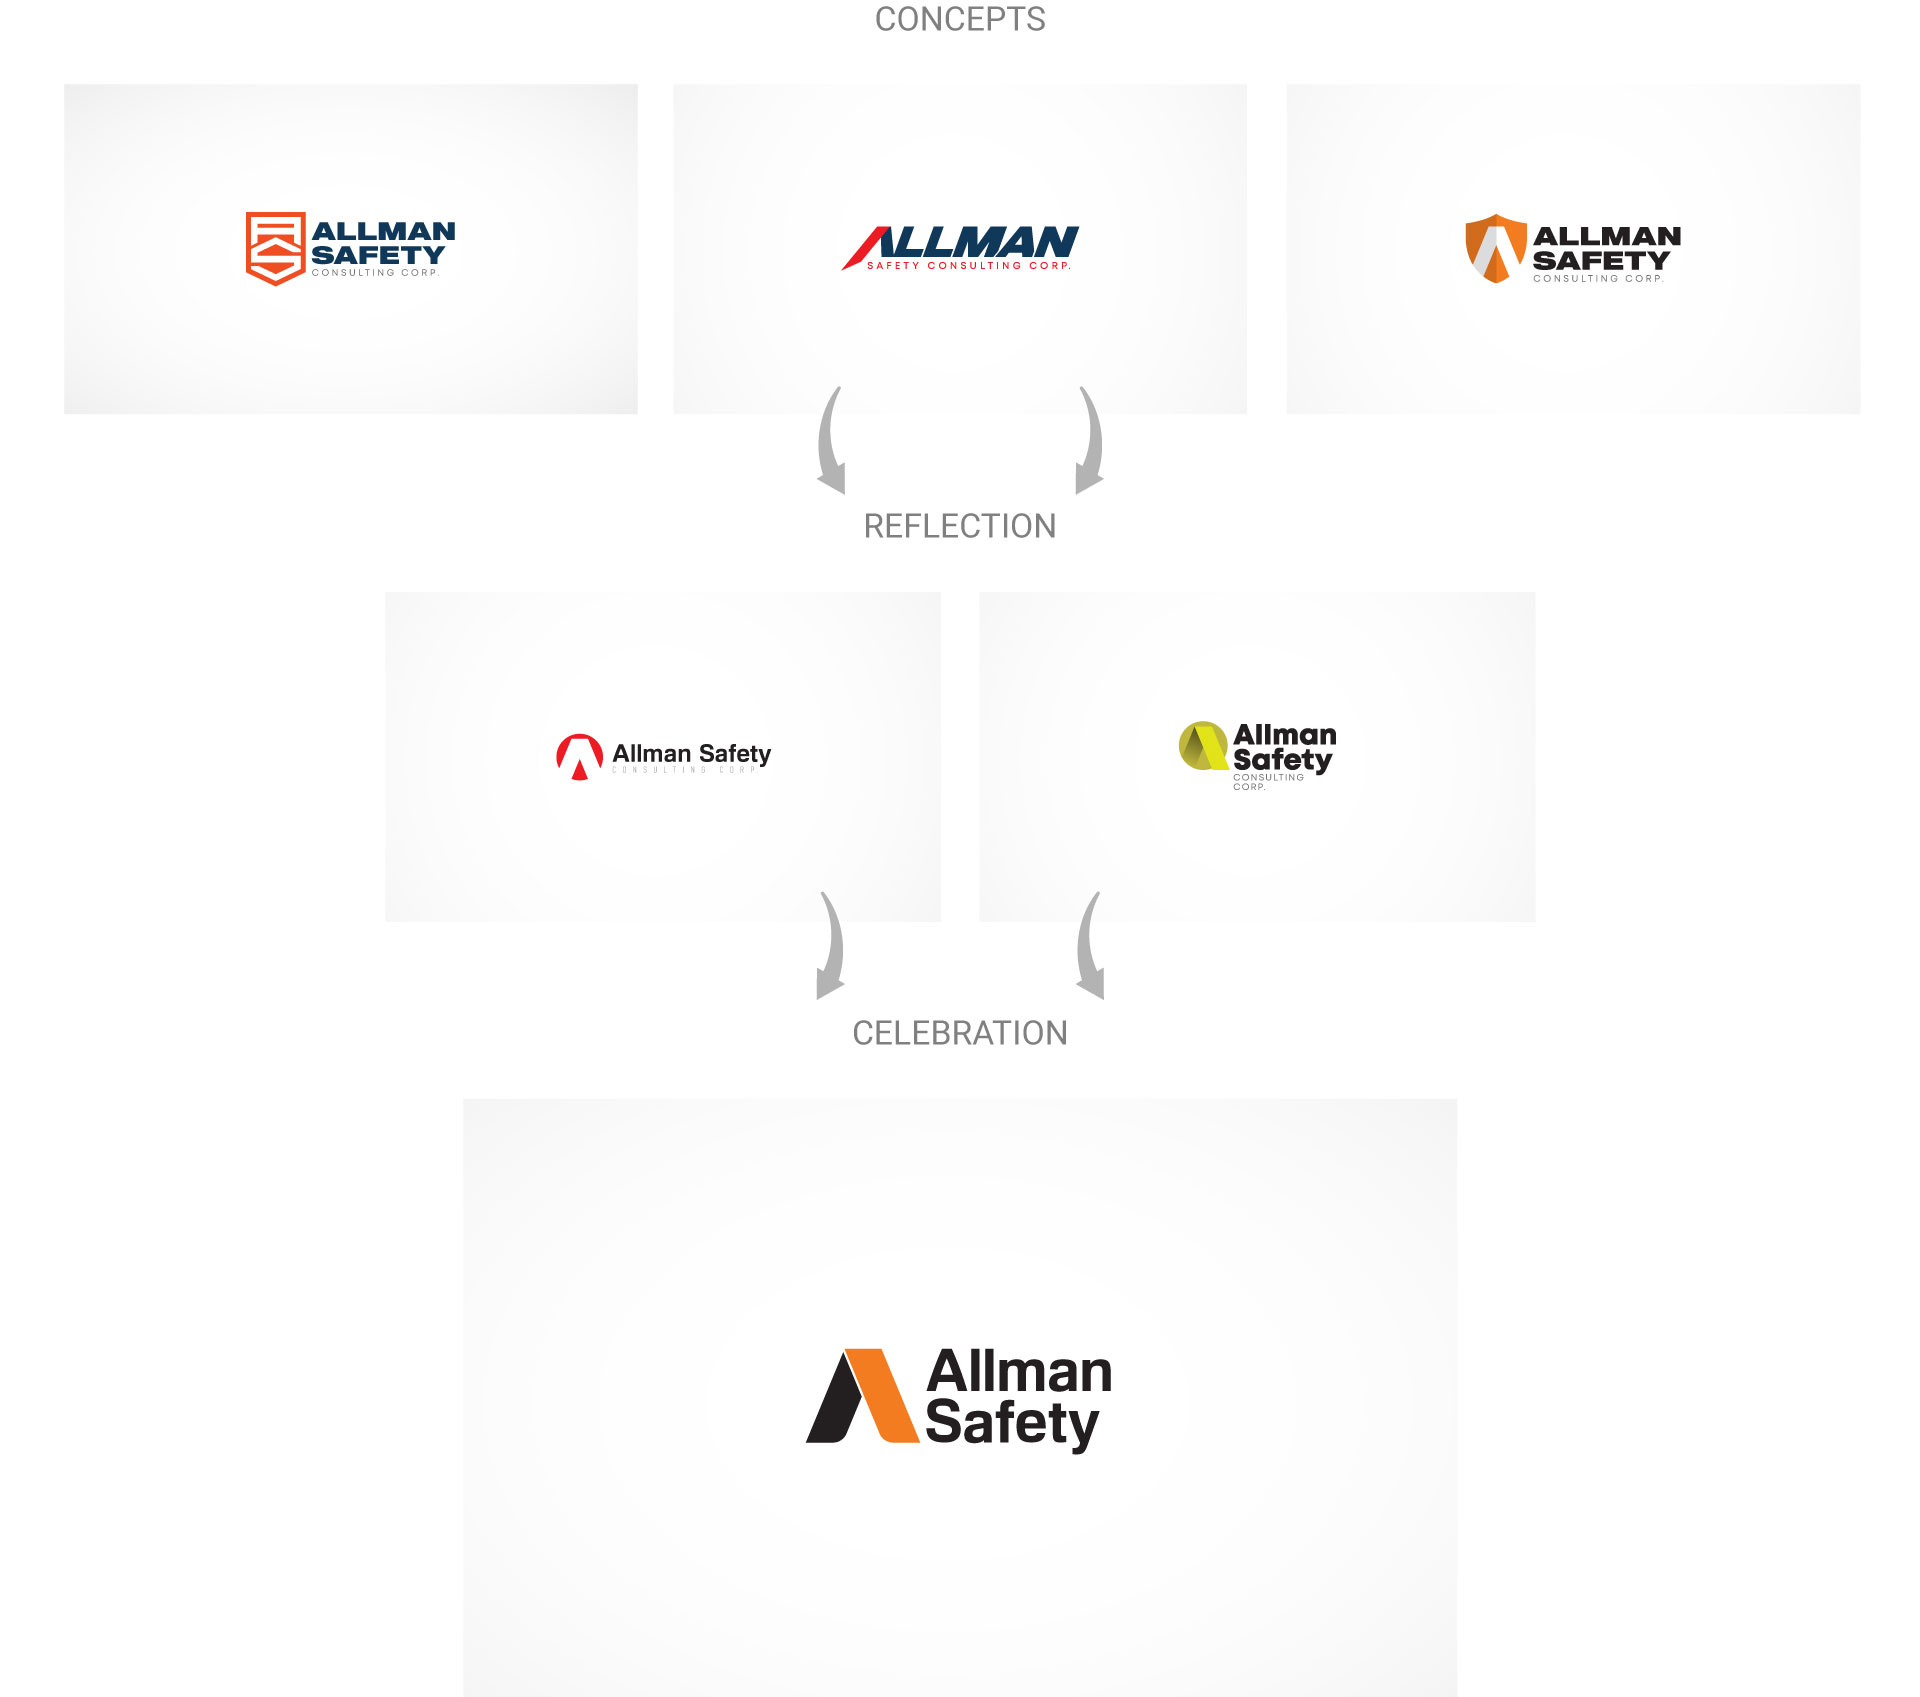 allman-safety-logo-design-process-by-mapleweb-vancouver-canada